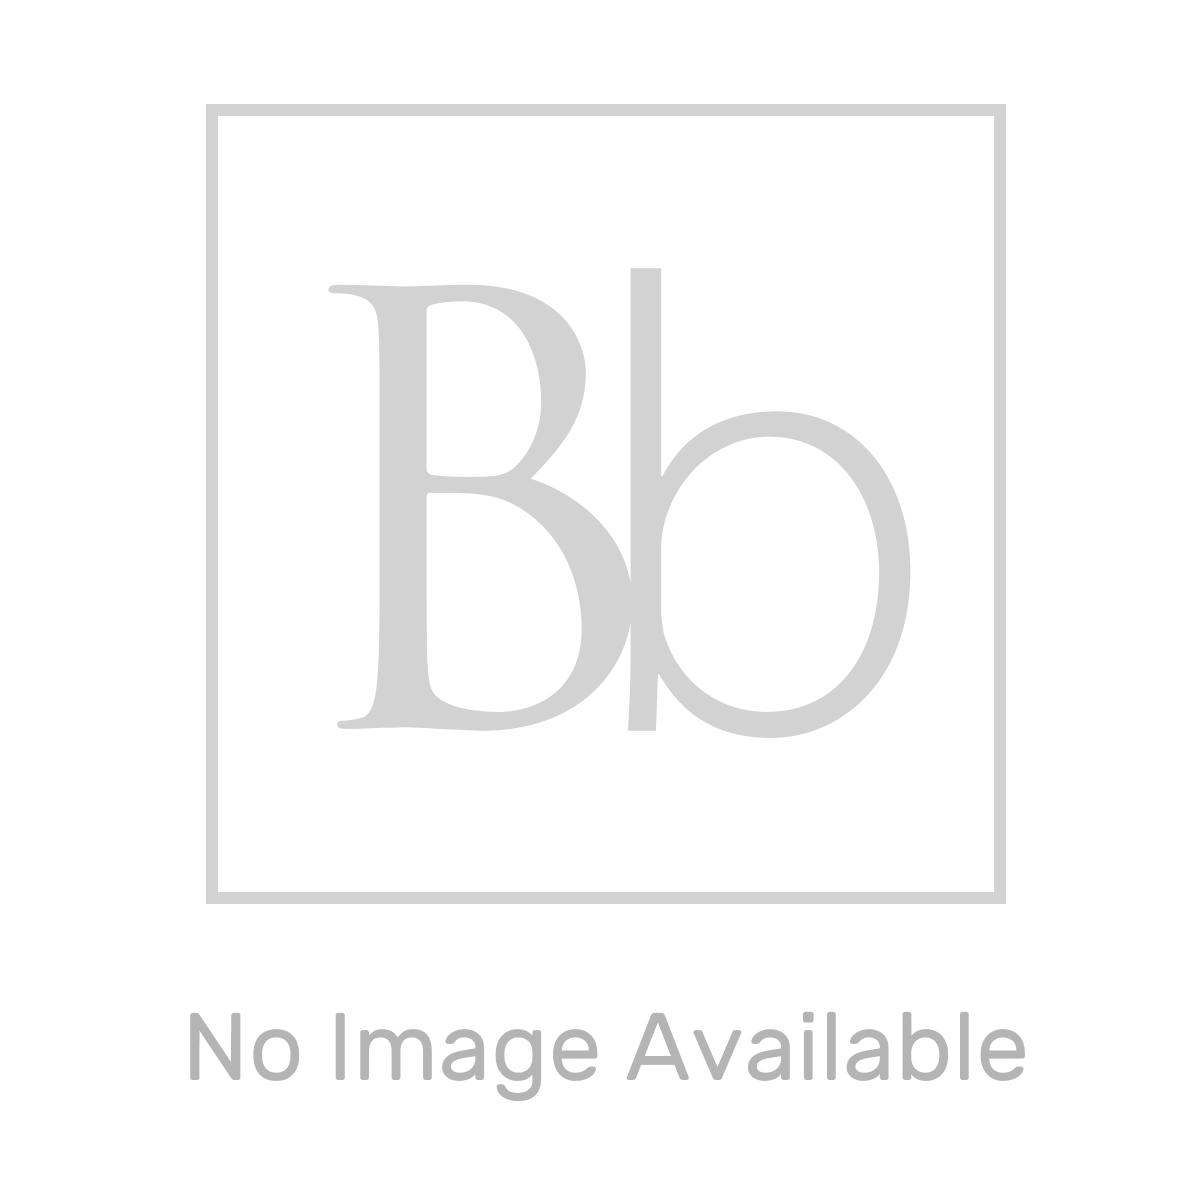 RAK Black Dual Outlet 2 Handle Thermostatic Shower Valve